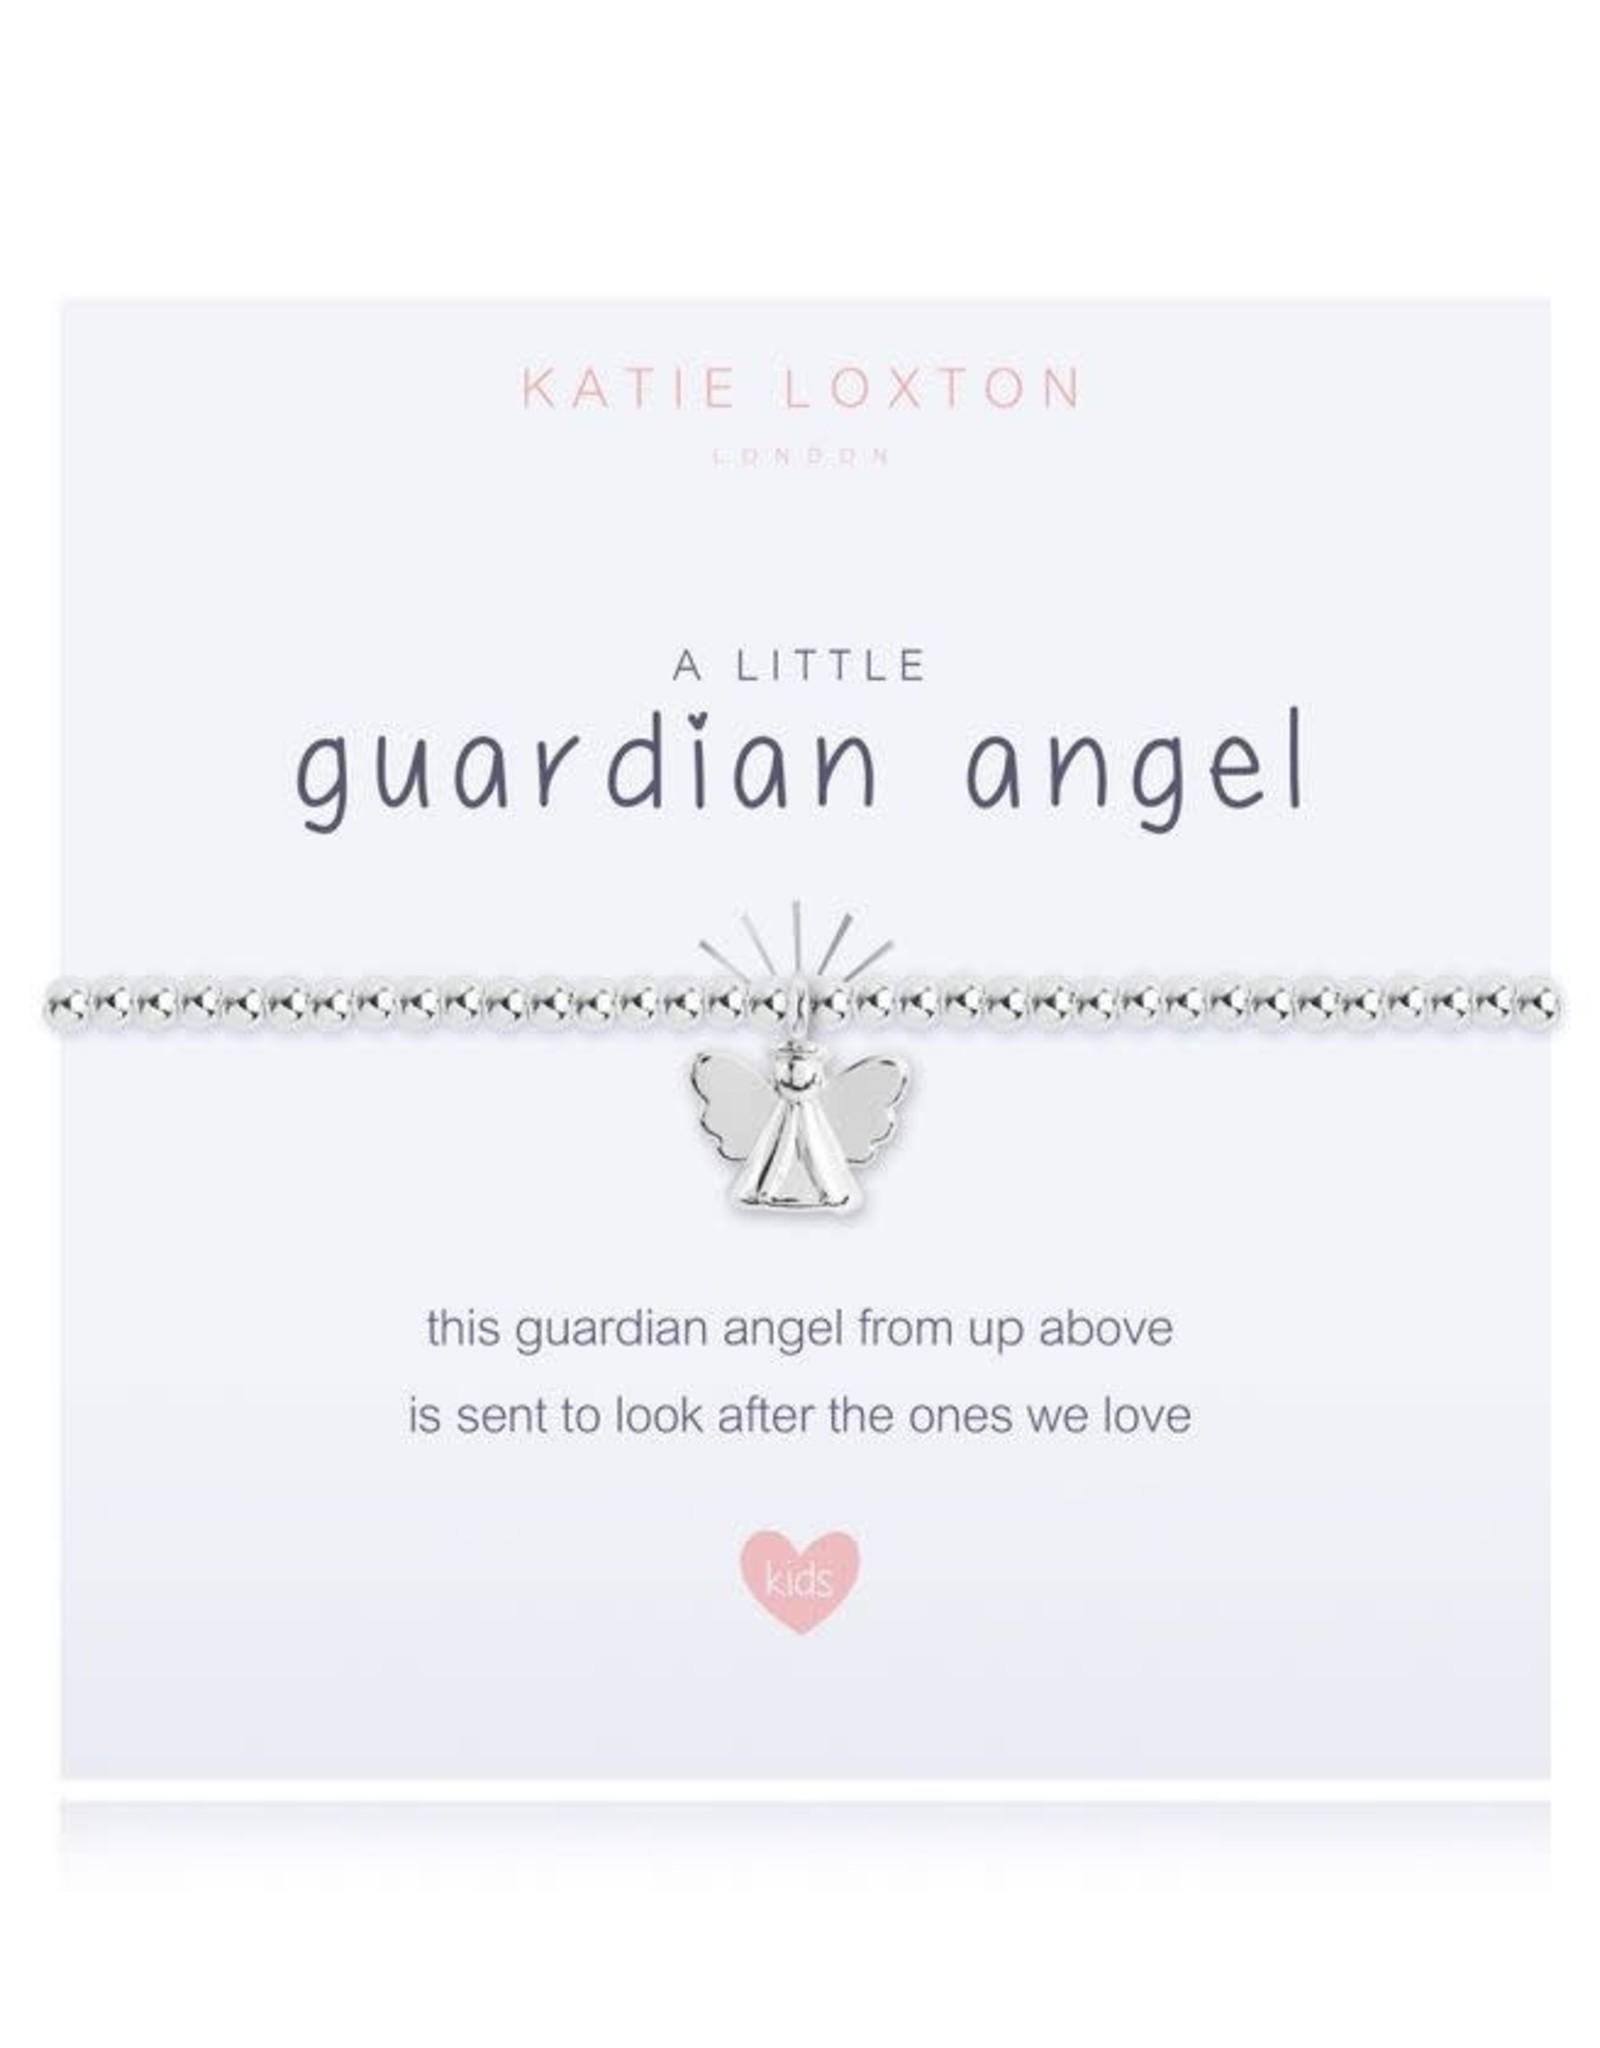 Katie Loxton Child's Beaded Bracelet-Guardian Angel